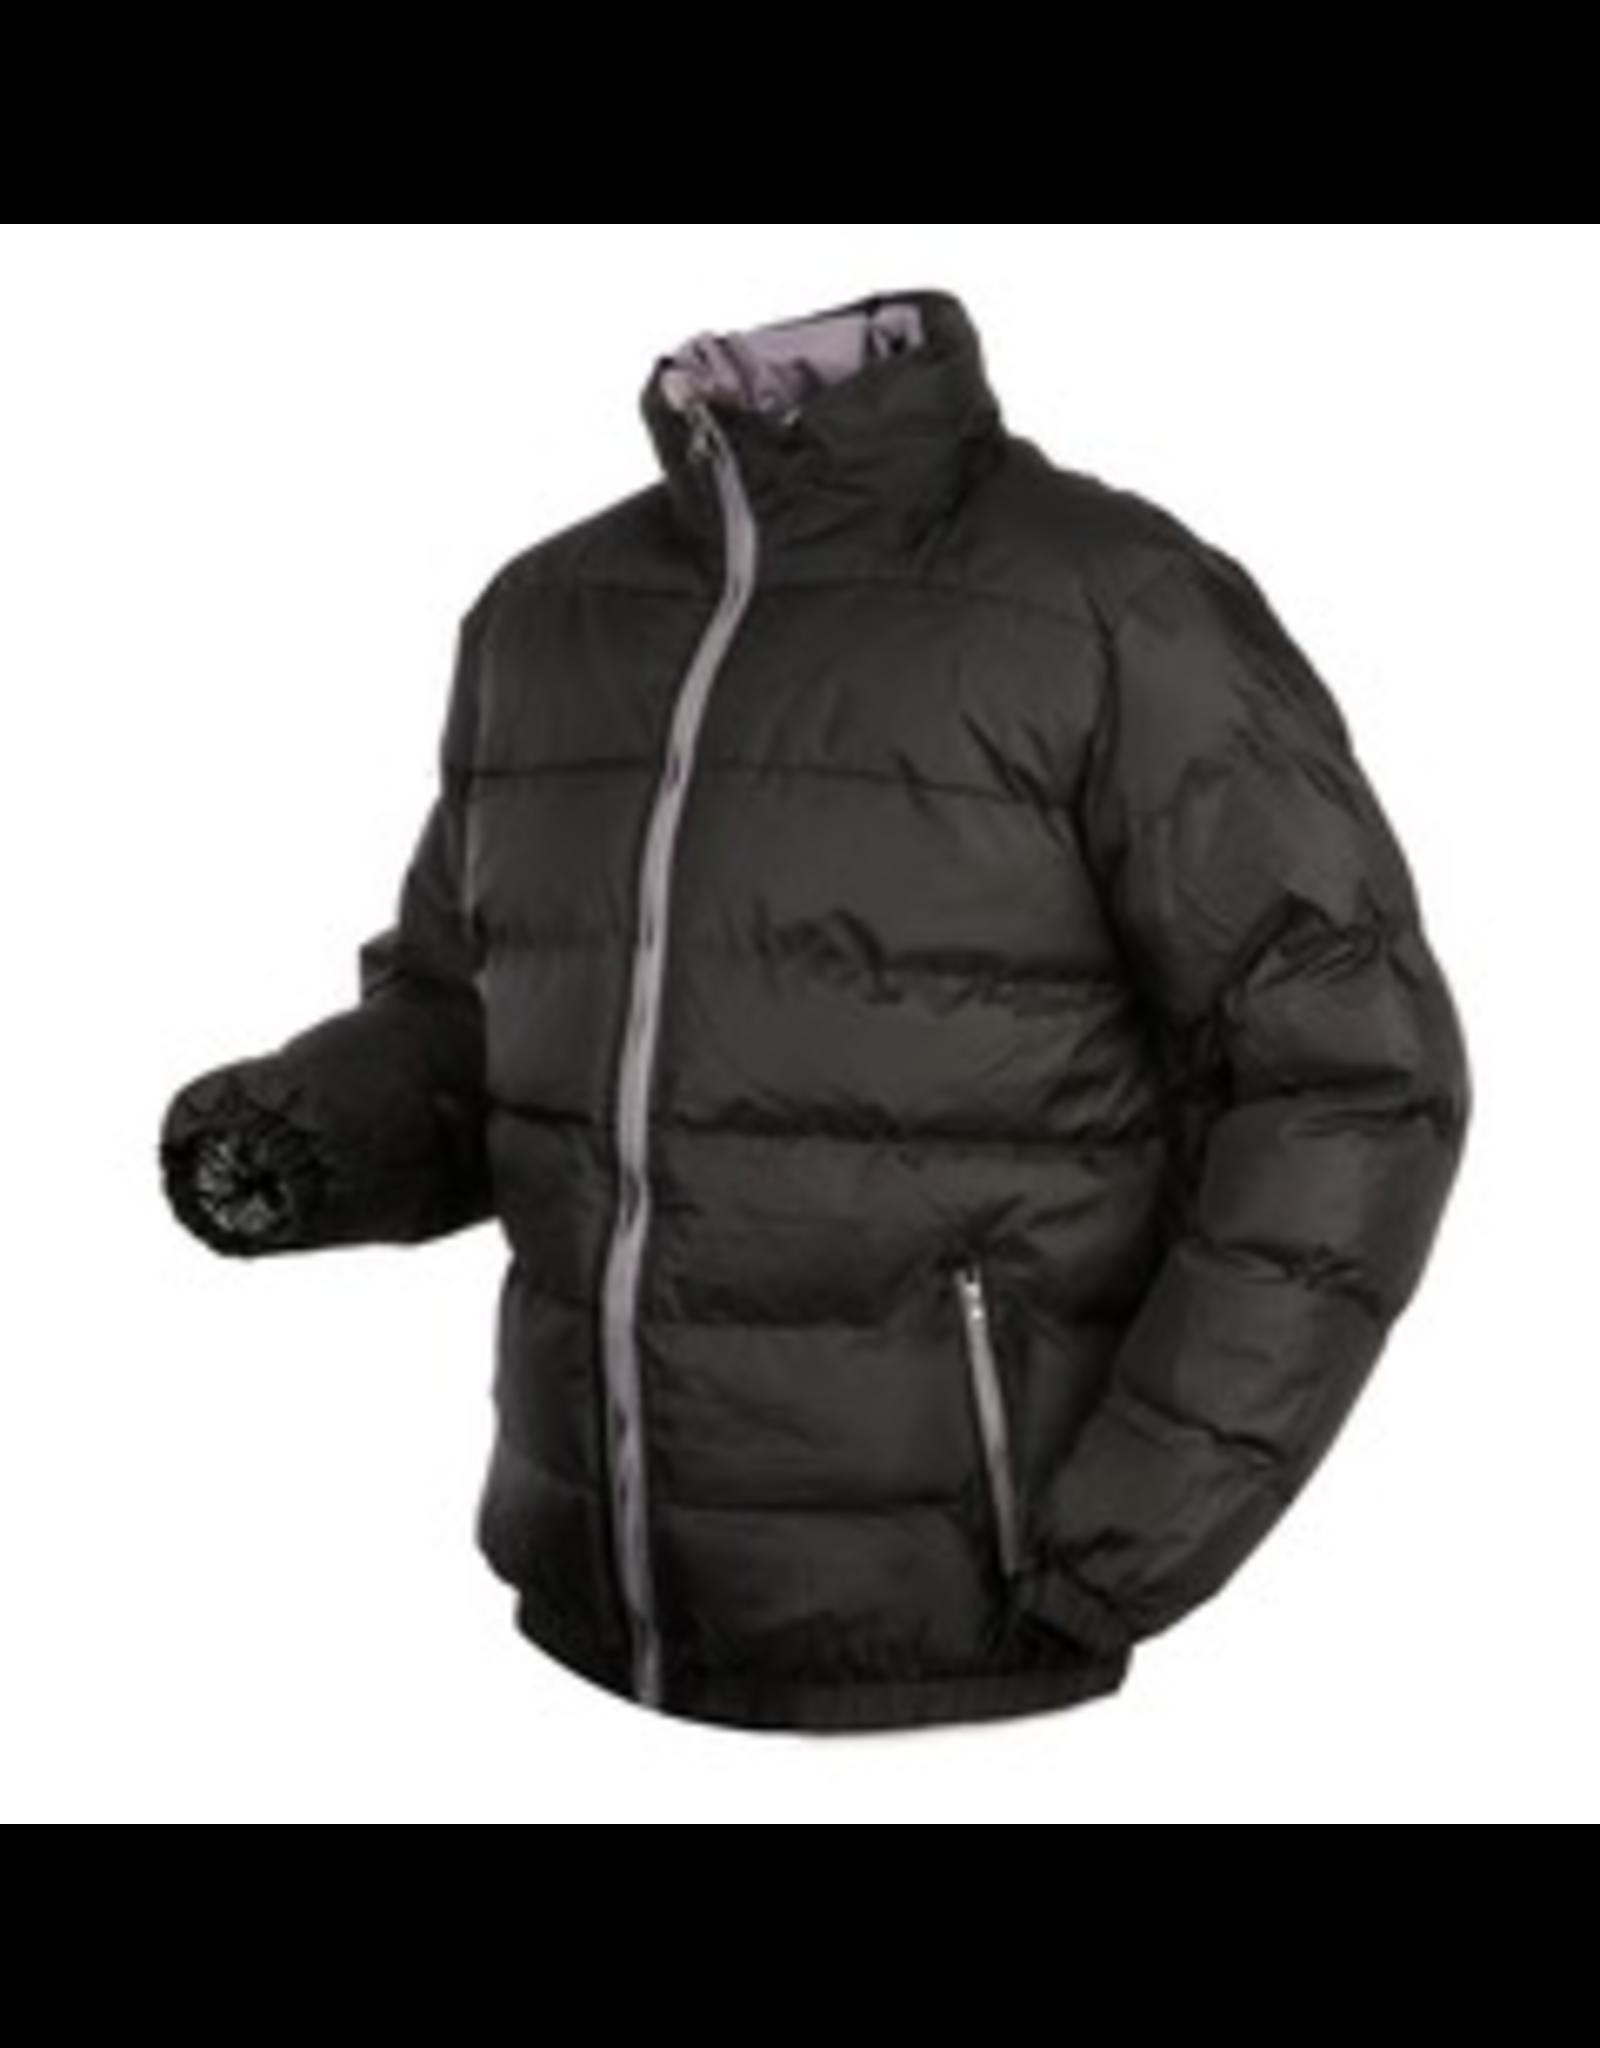 GKS Ganka GKS Polyester Jacket